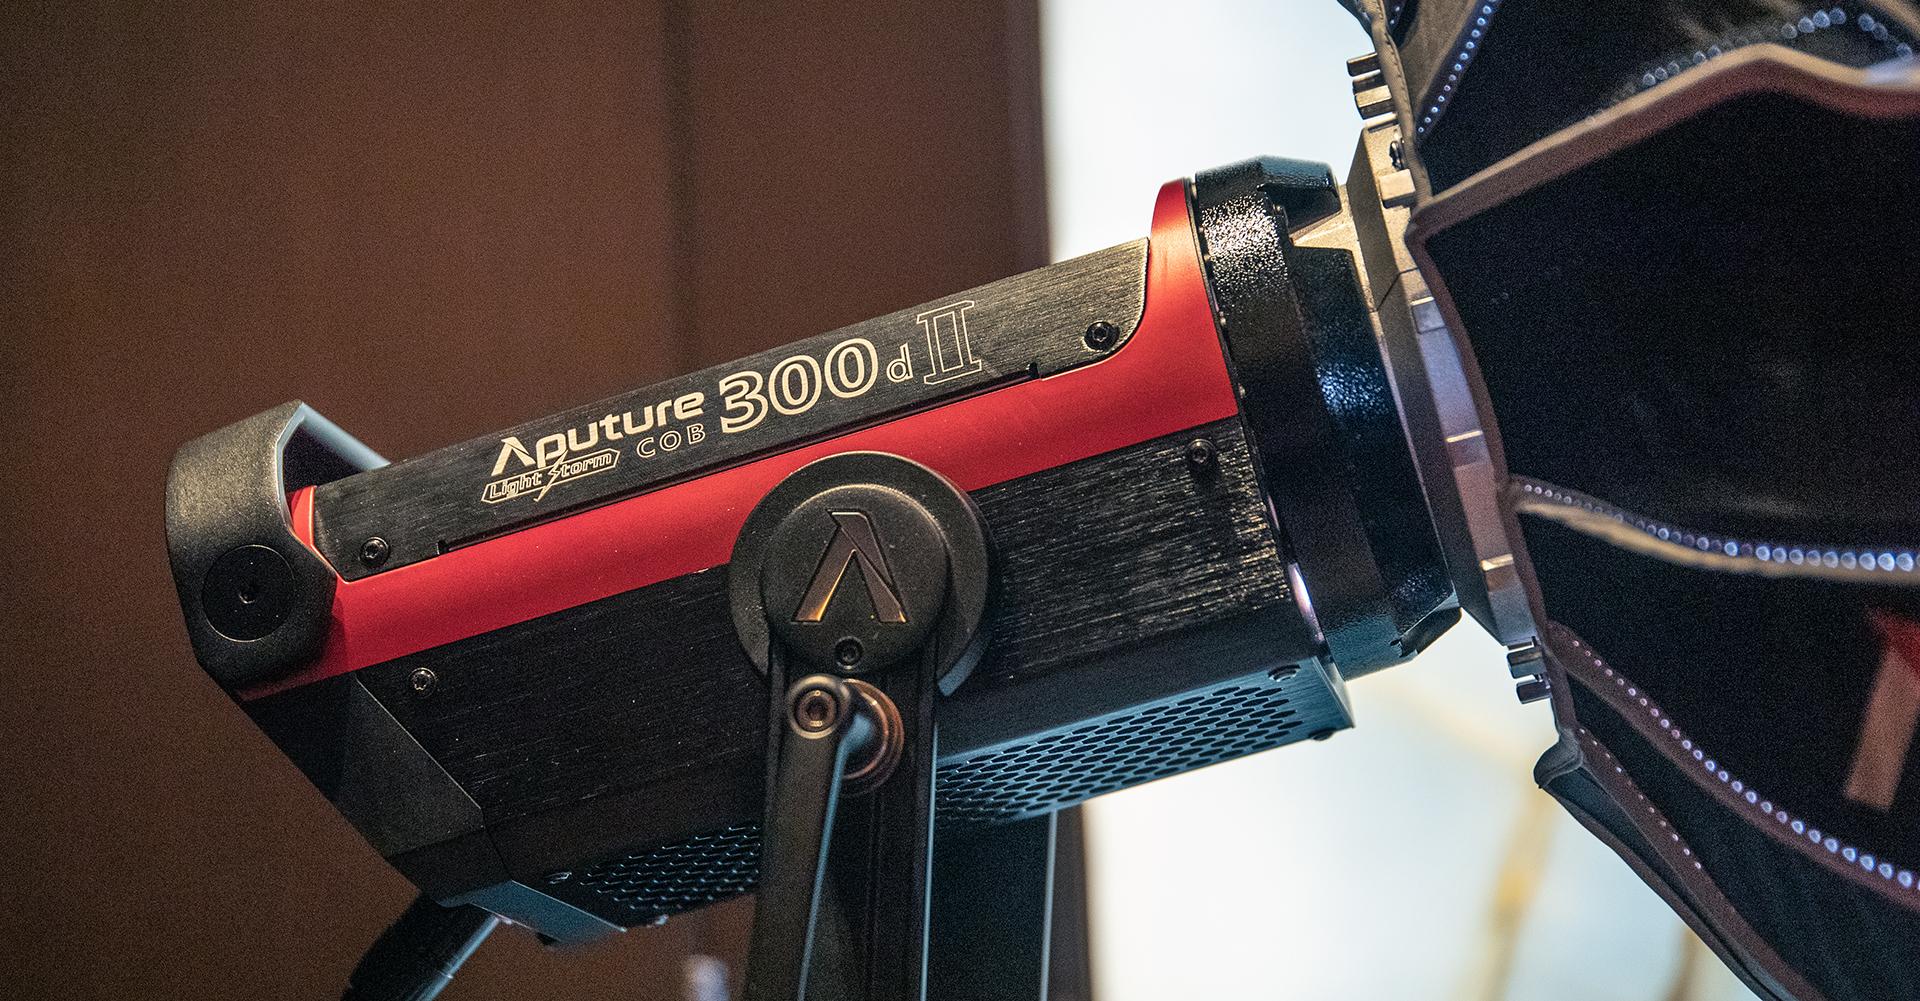 Aputure Announces LS C300d MKII, a Lightbulb, Two LED Panels